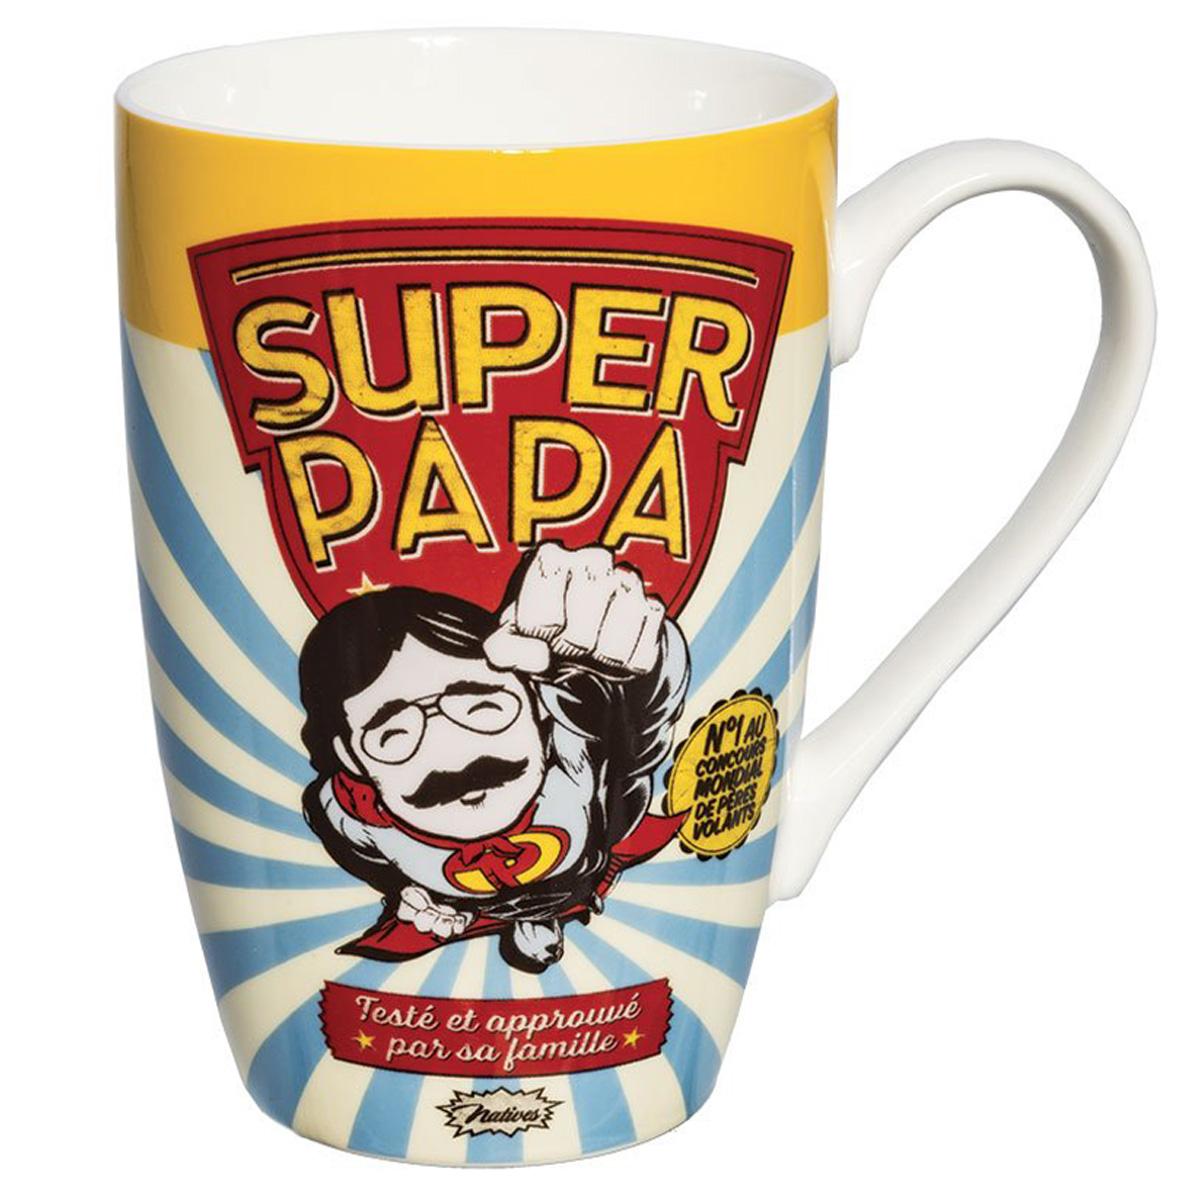 Grand mug porcelaine \'French Vintage\' (Super Papa) - 13x85 cm (46cl) - [Q7150]